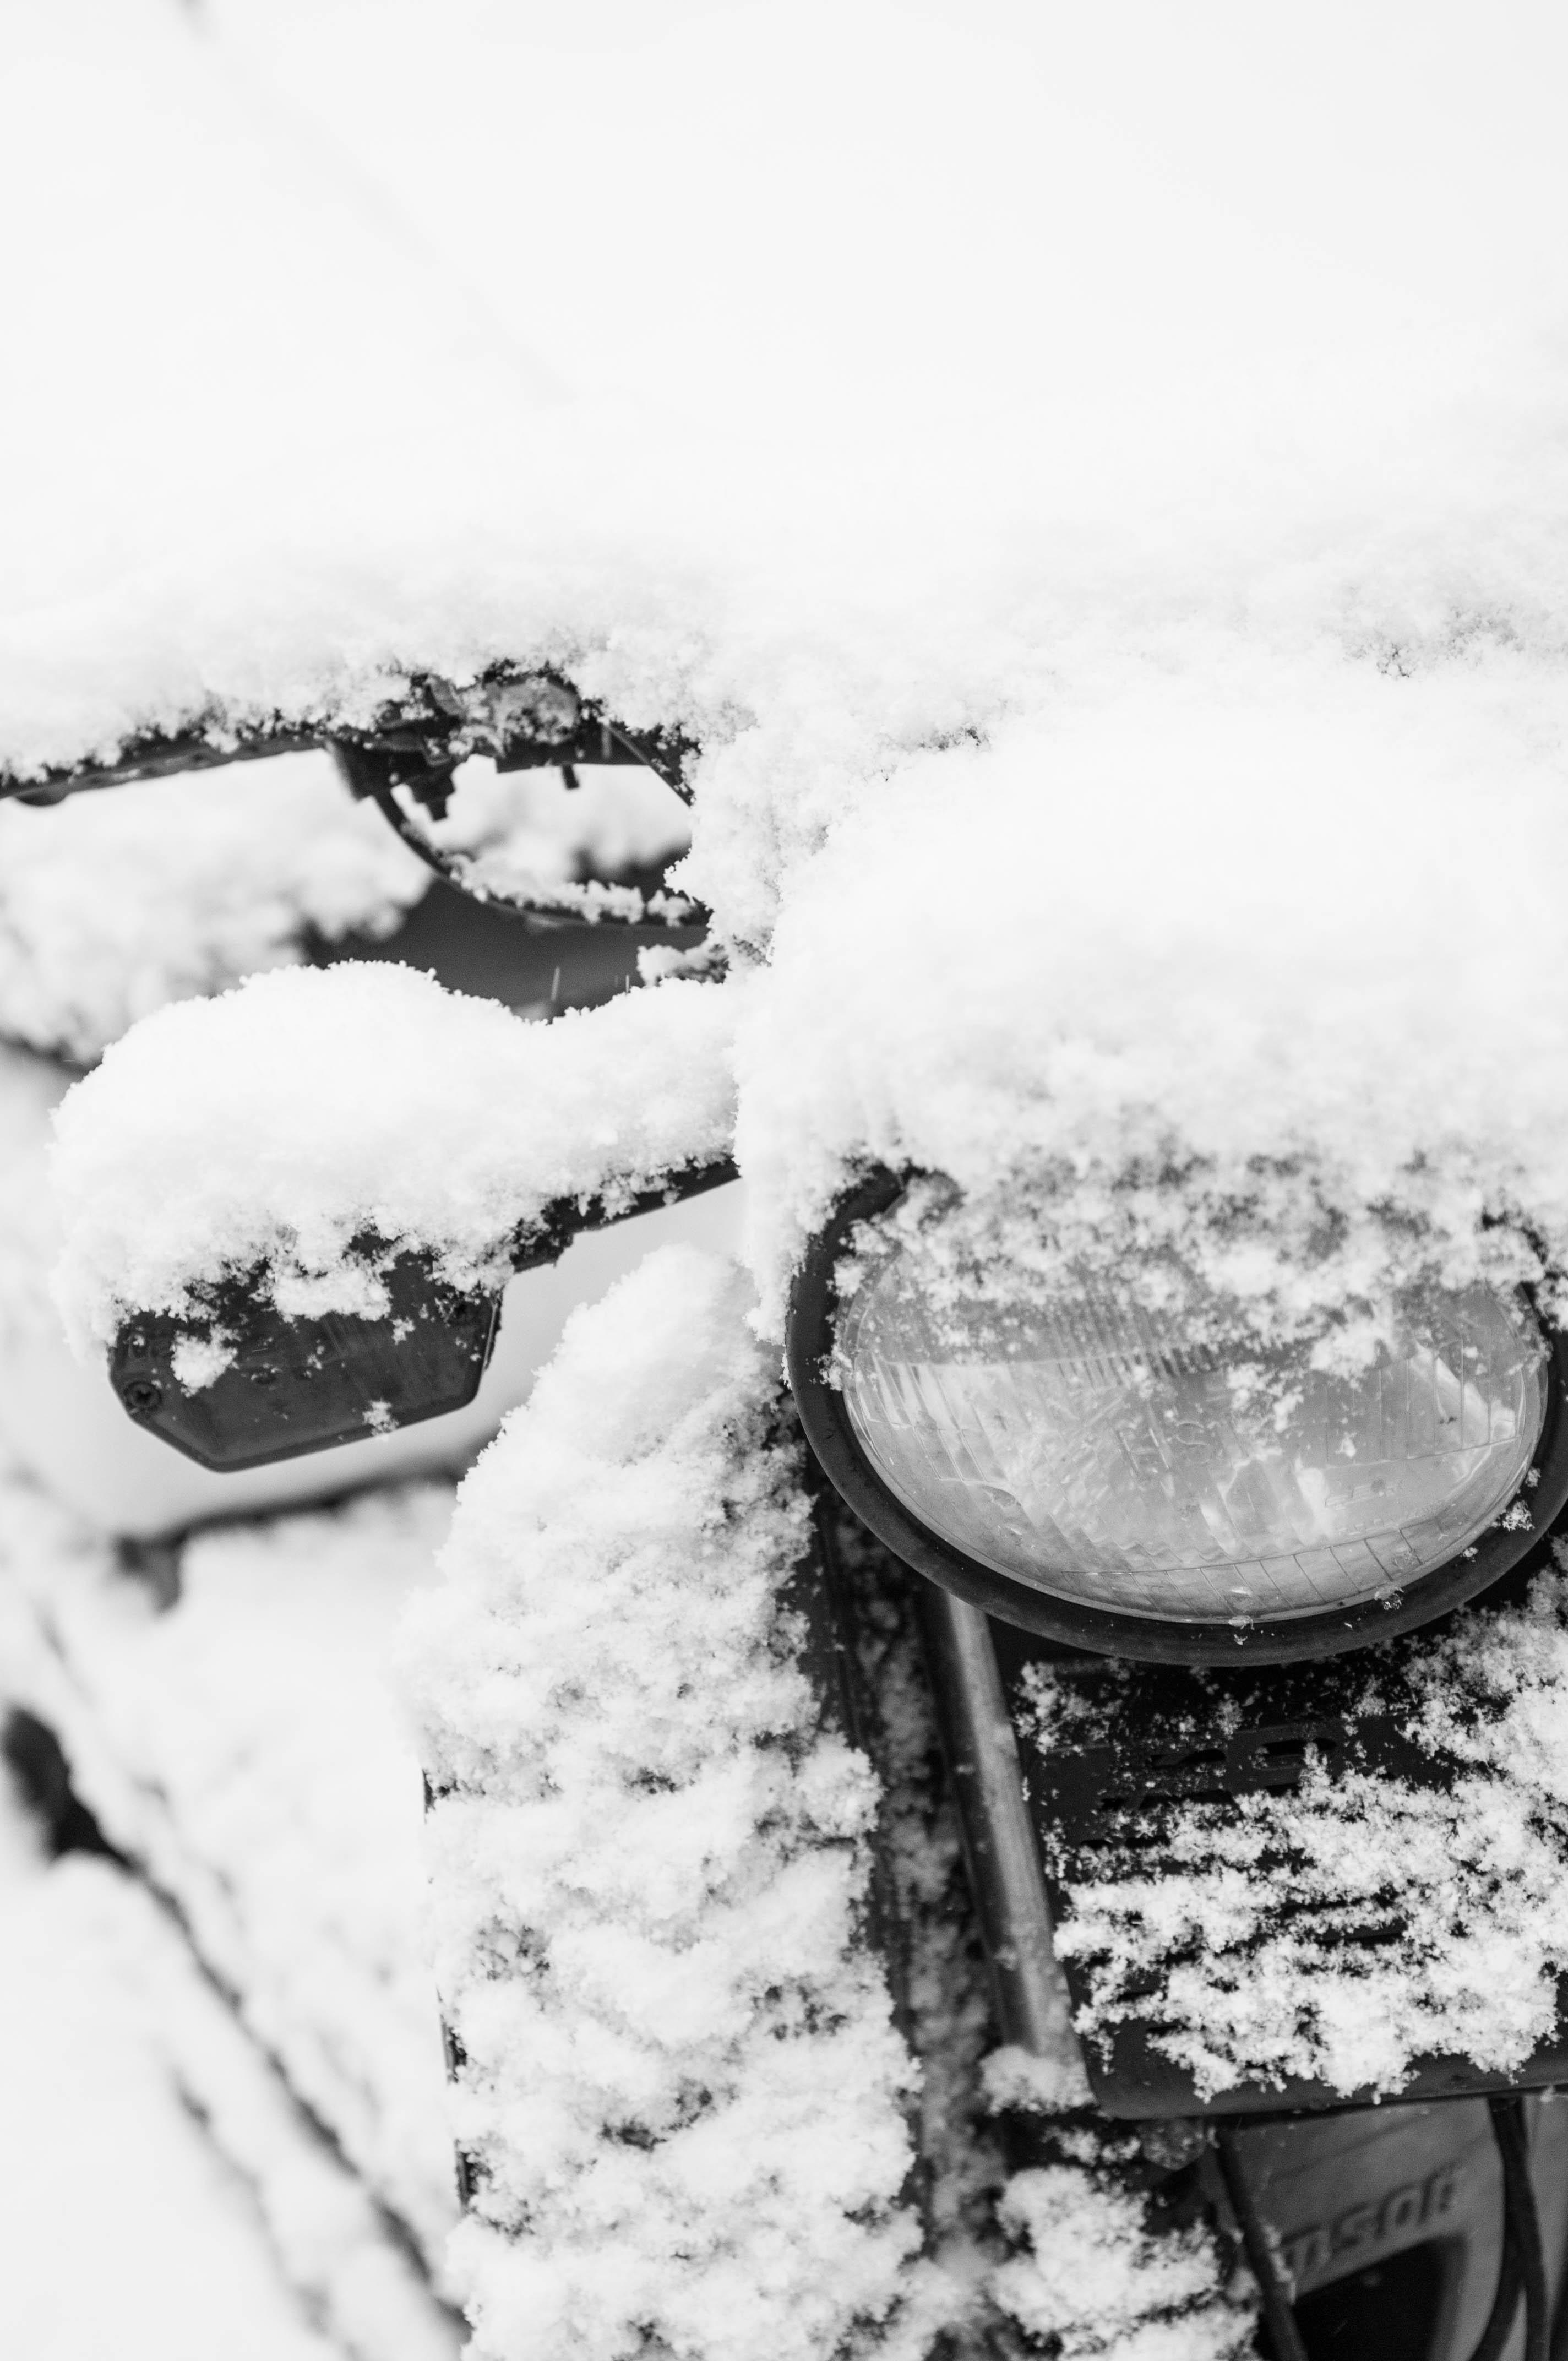 Moped im Schnee